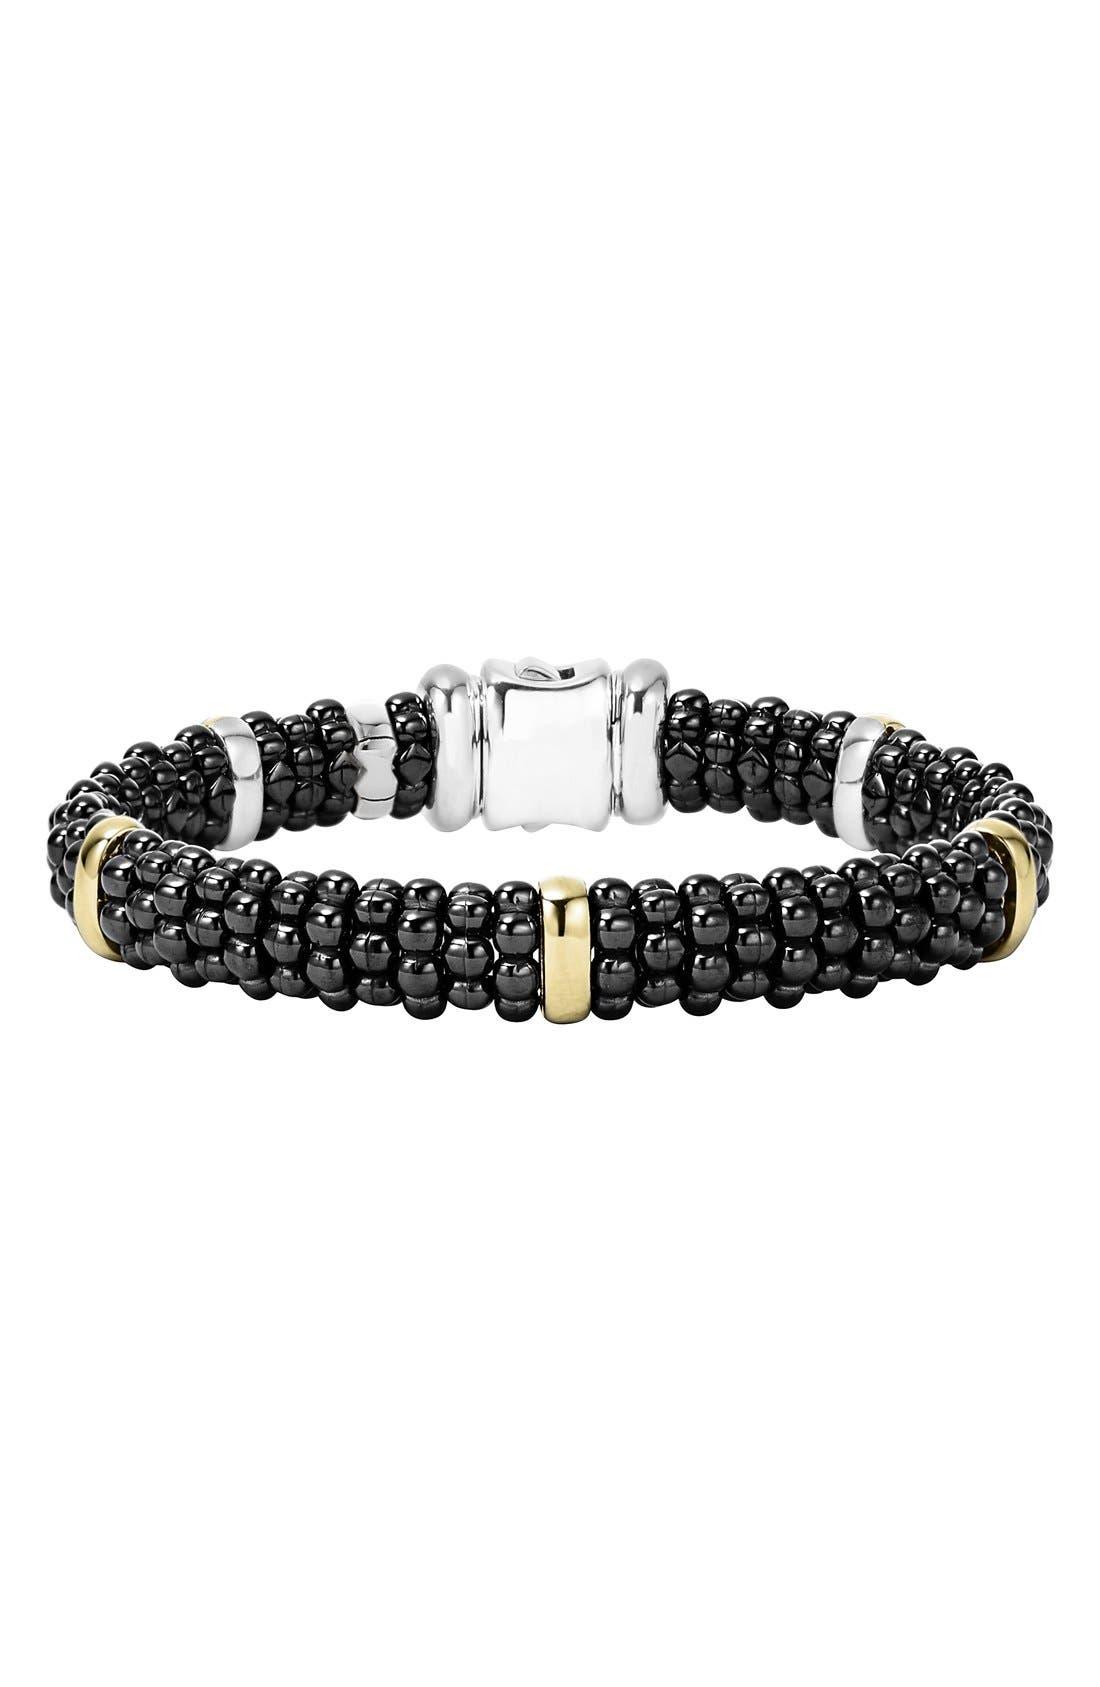 LAGOS 'Black Caviar' Rope Bracelet